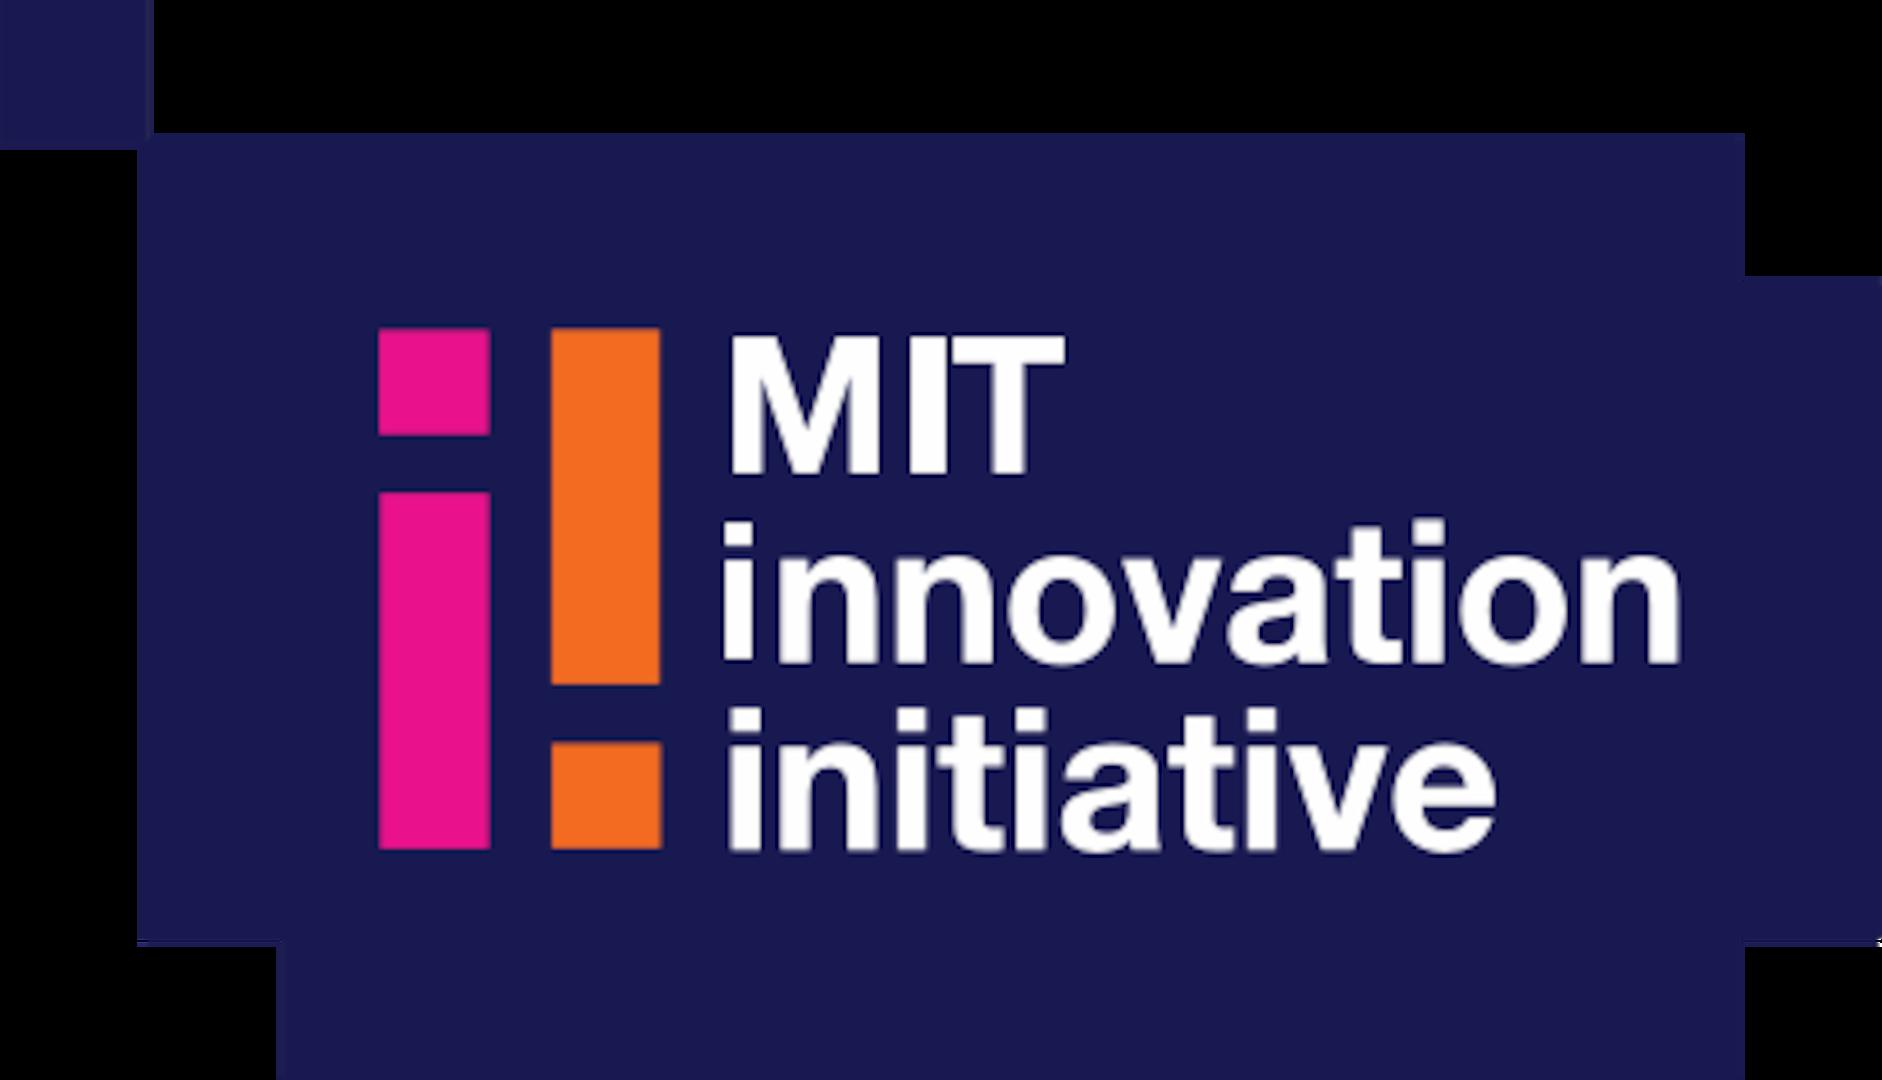 MIT innovation initiative logo